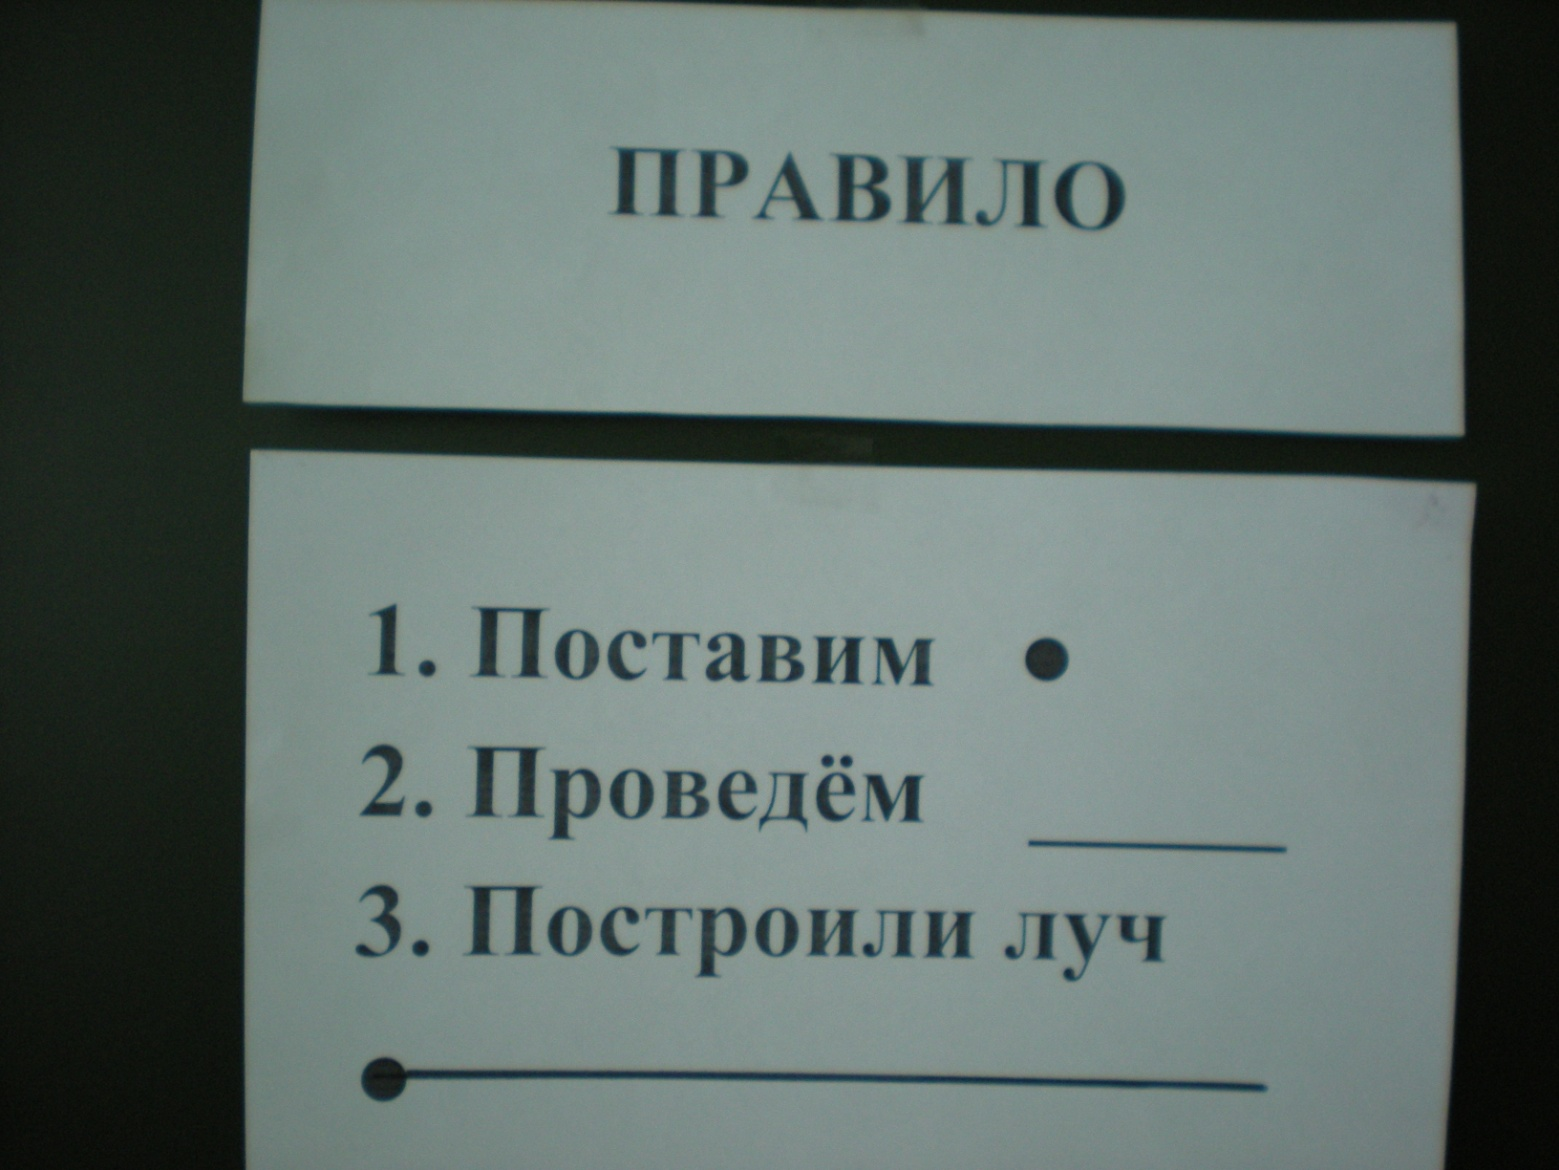 C:\Users\пк\Desktop\Фотографии\1 класс\8.JPG